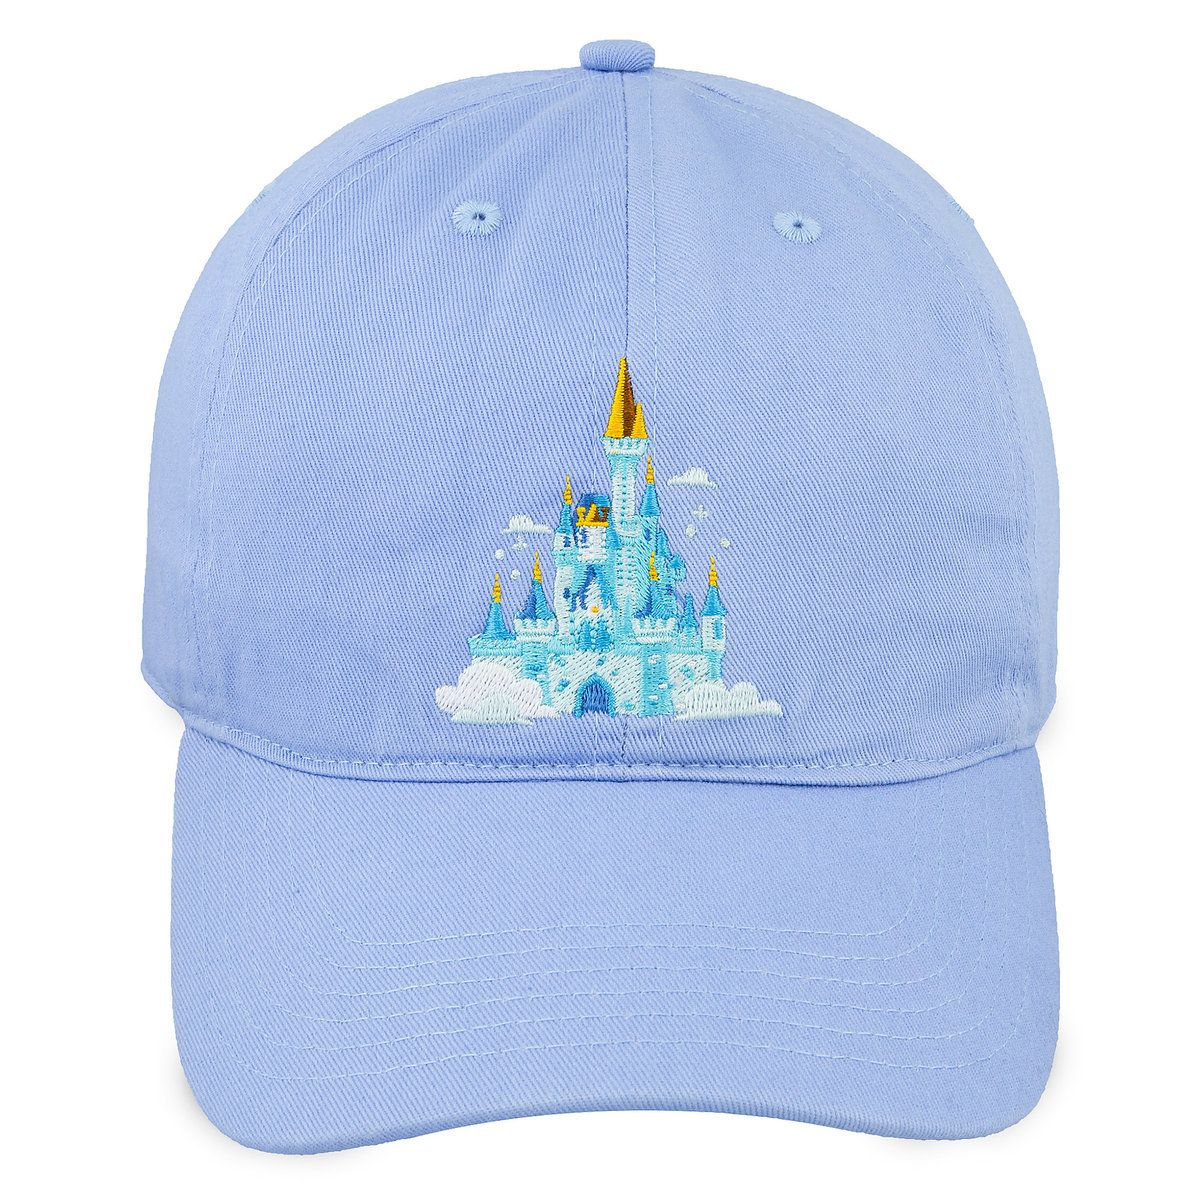 75a5204c2fda2d Cinderella Castle Baseball Cap for Adults - Walt Disney World ...